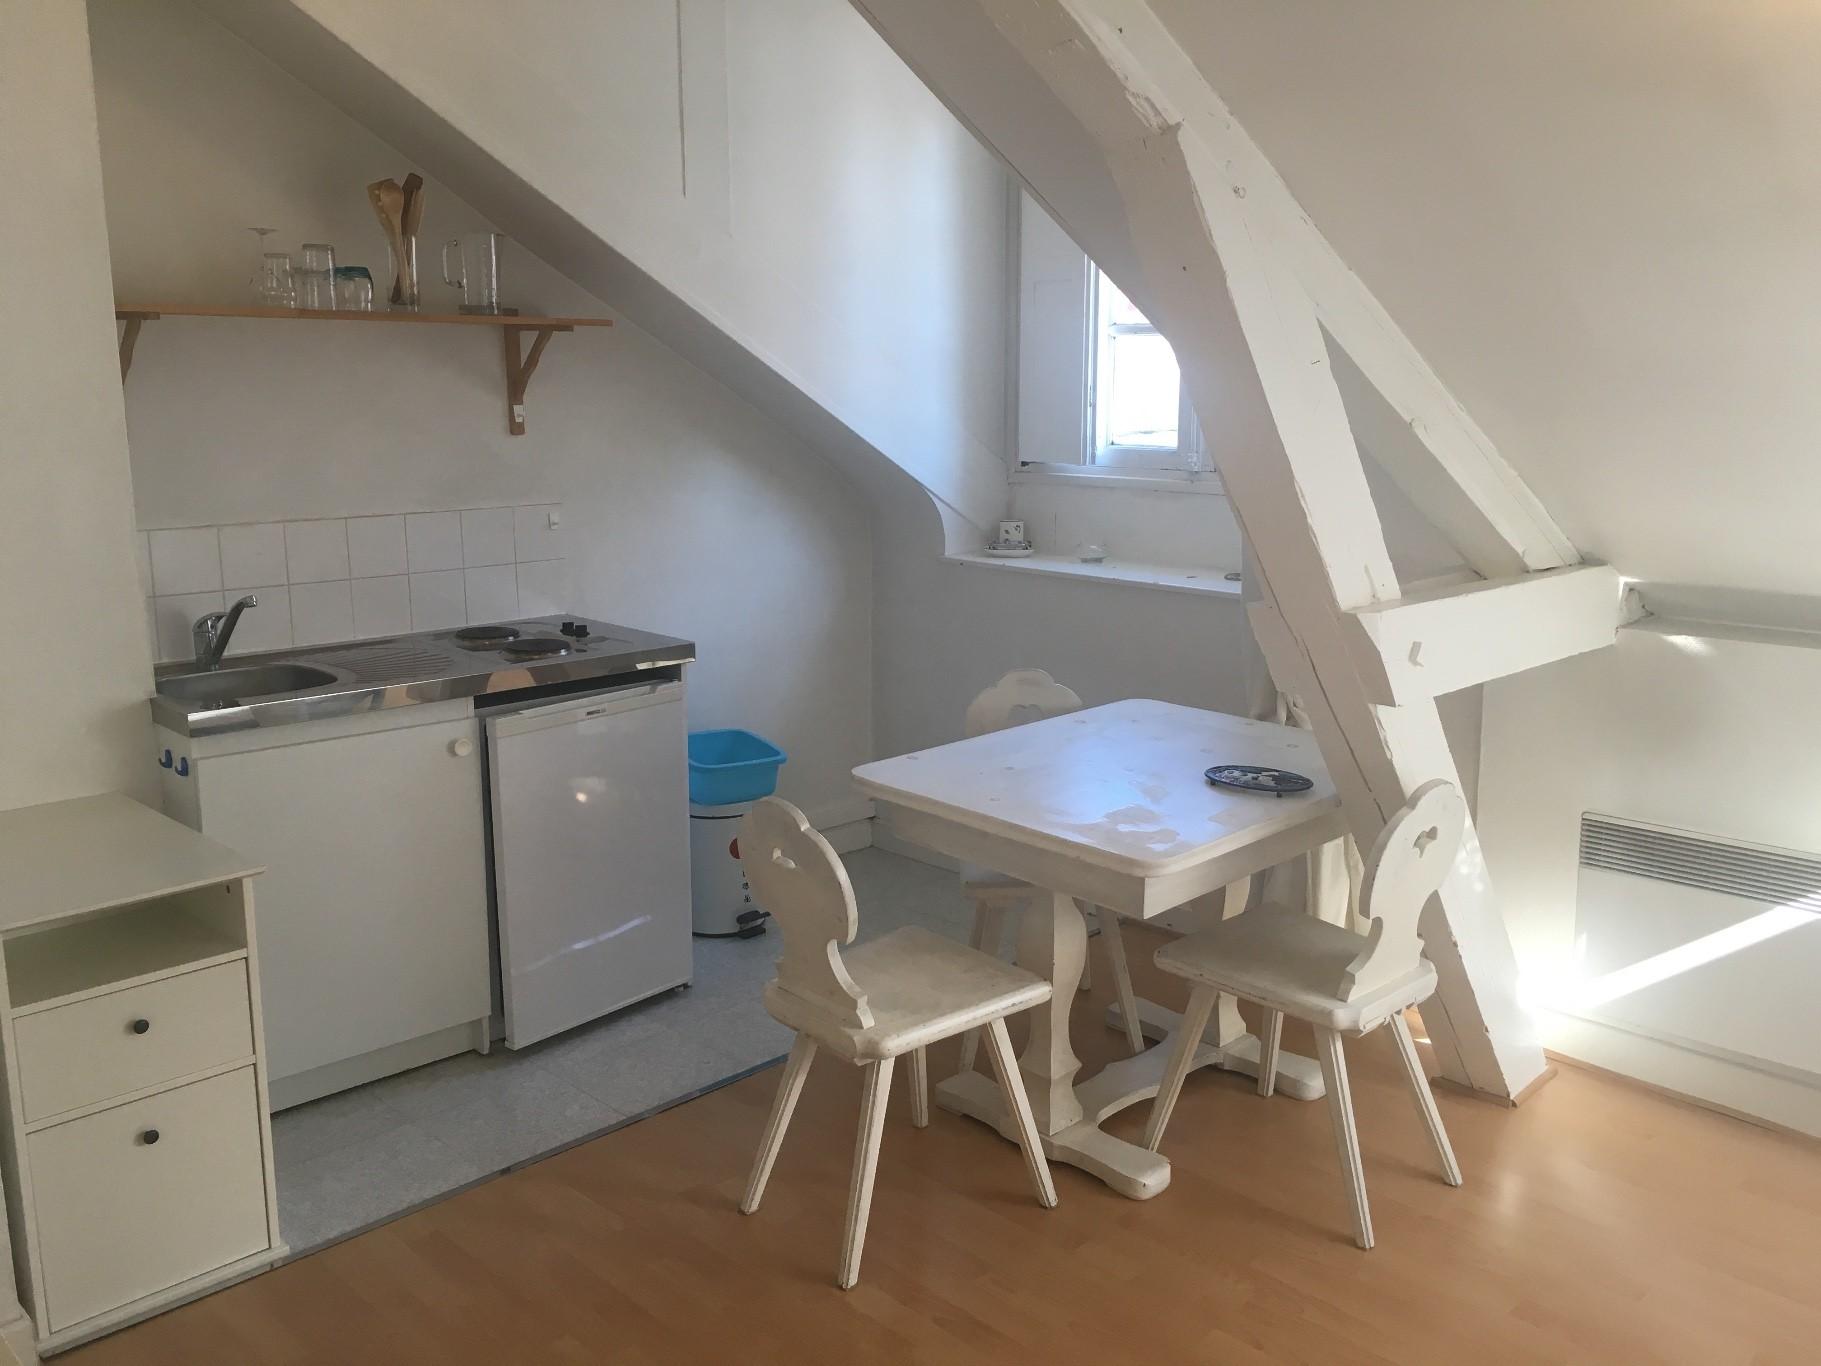 dijon facs location studio 1 pi ce 20m2 360 cc r f 16 199 182147 cm immobilier. Black Bedroom Furniture Sets. Home Design Ideas